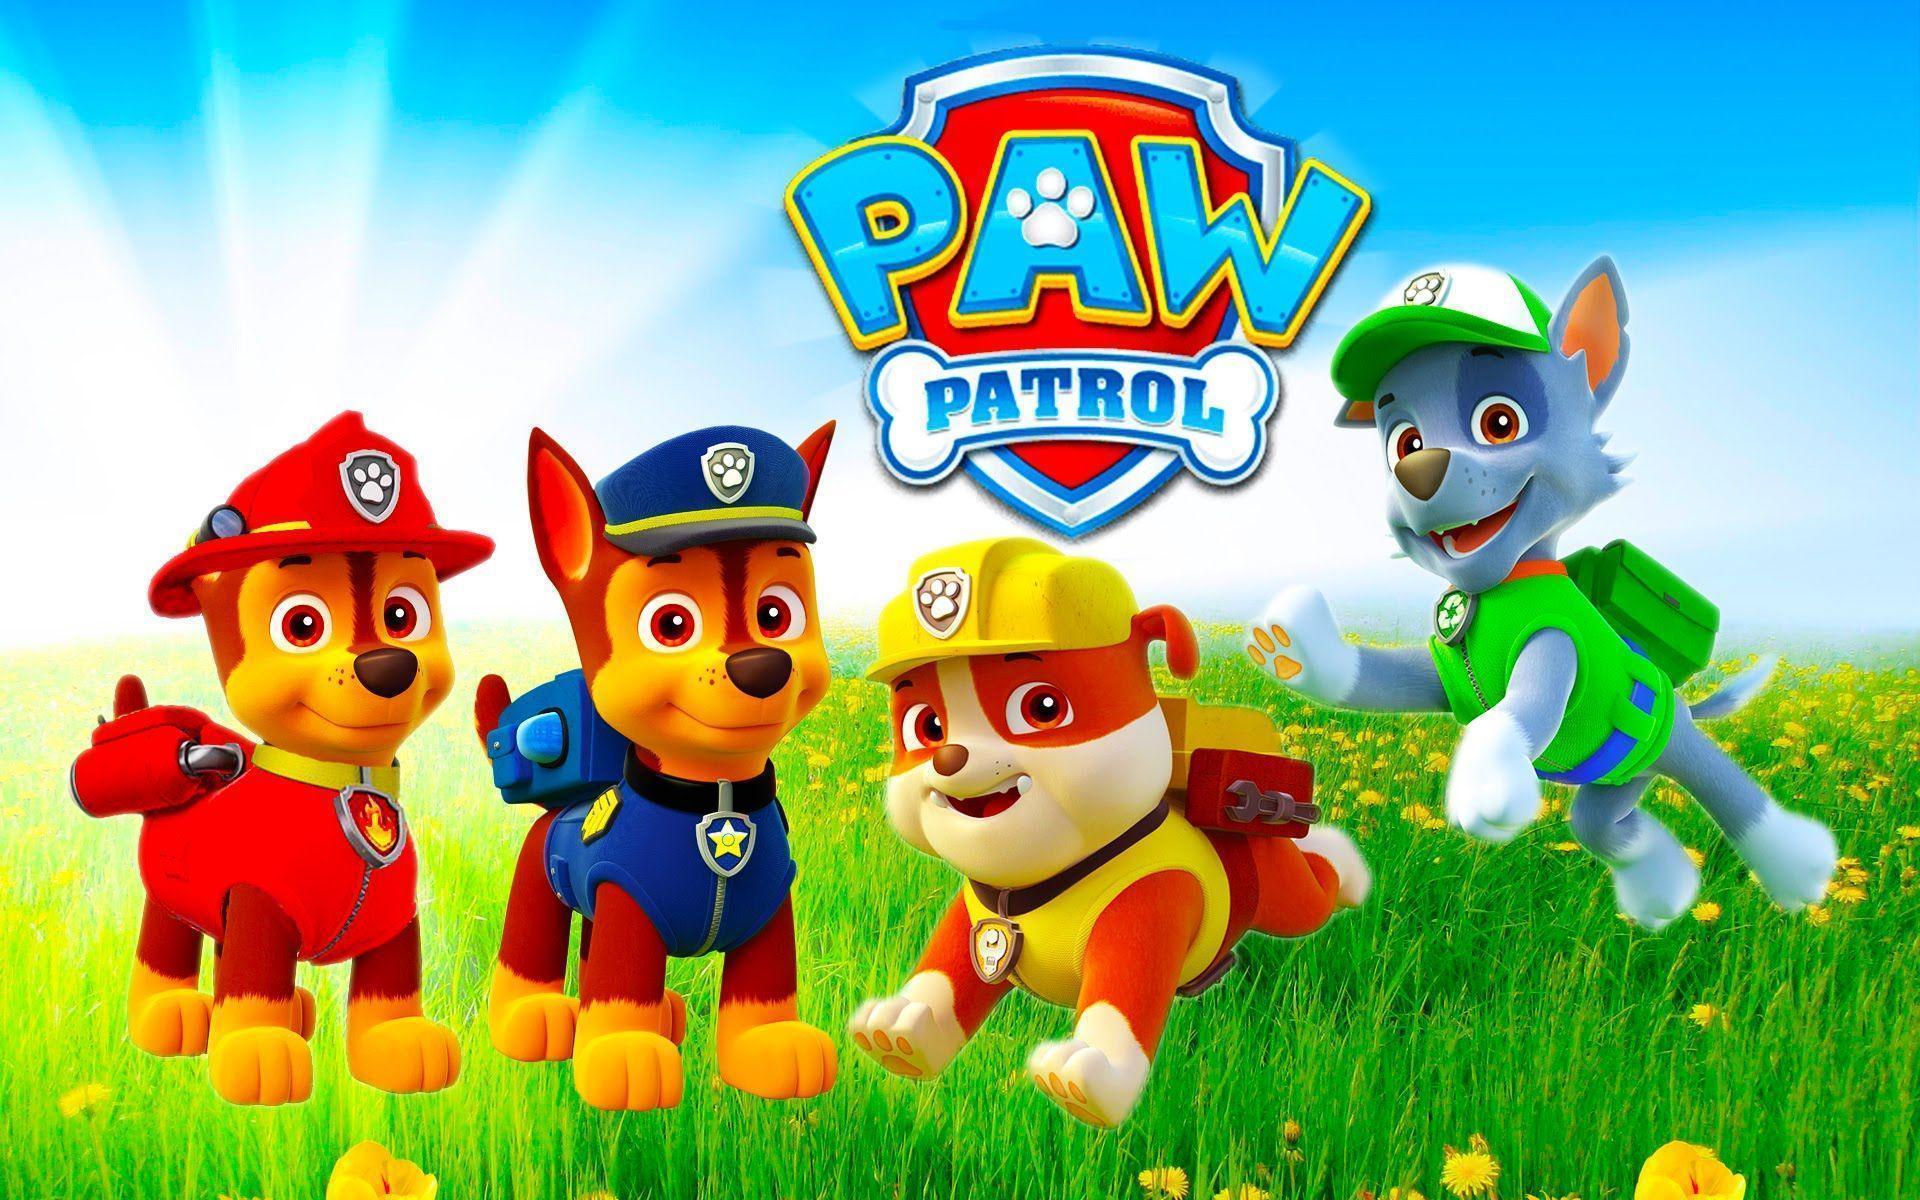 Paw Patrol Wallpapers - Wallpaper Cave